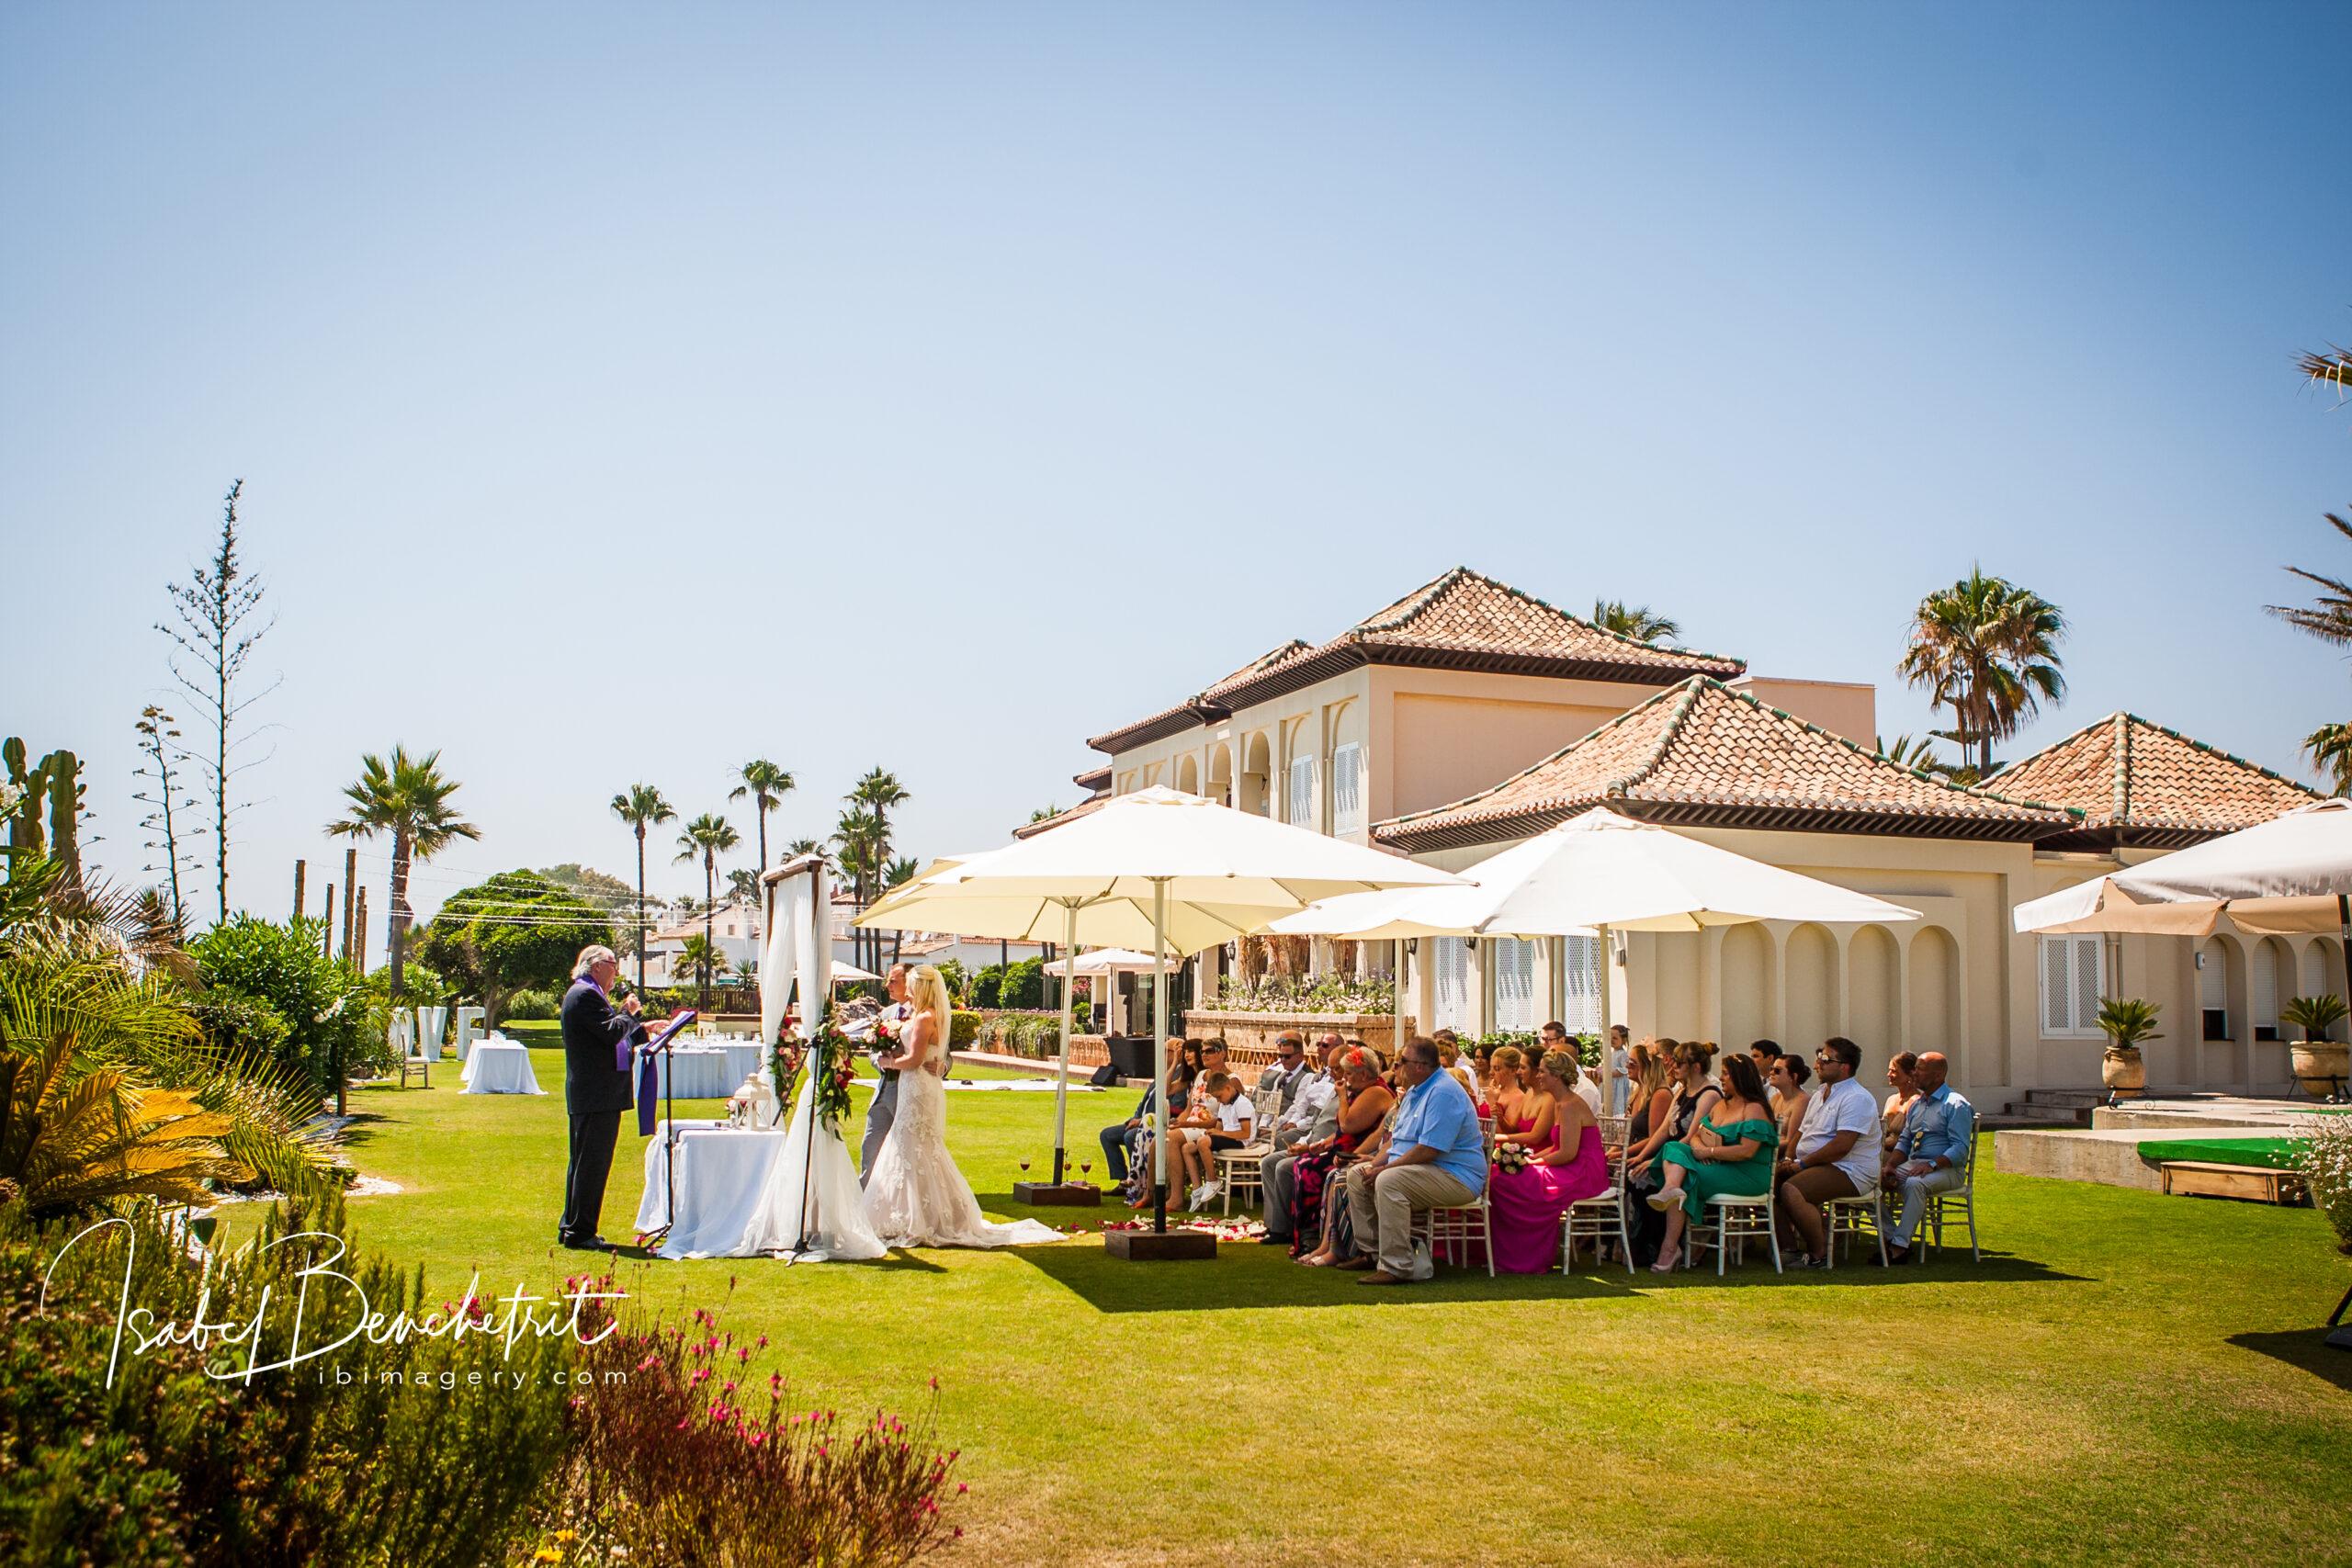 The wedding villa and wedding ceremony